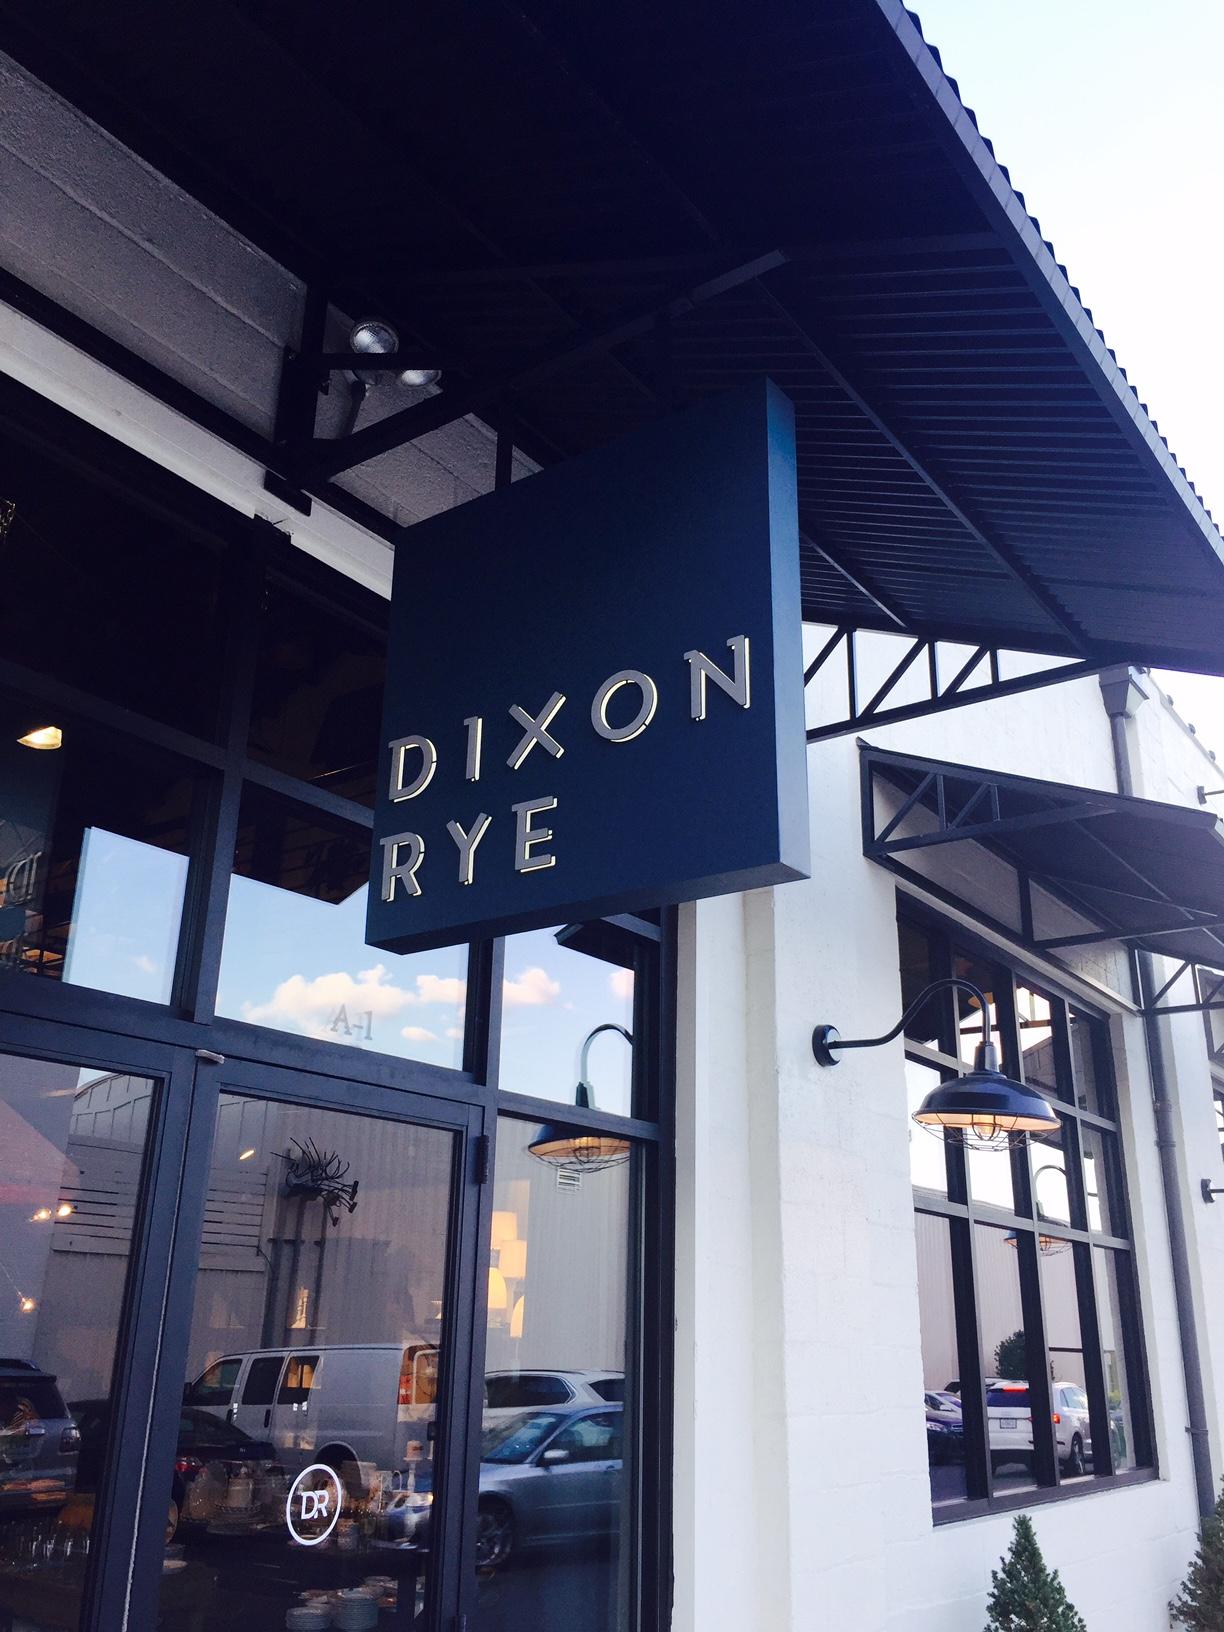 Ghost Atlas Exhibit with Trevor Forest at Dixon Rye | Atlanta Homes & Lifestyles Magazine